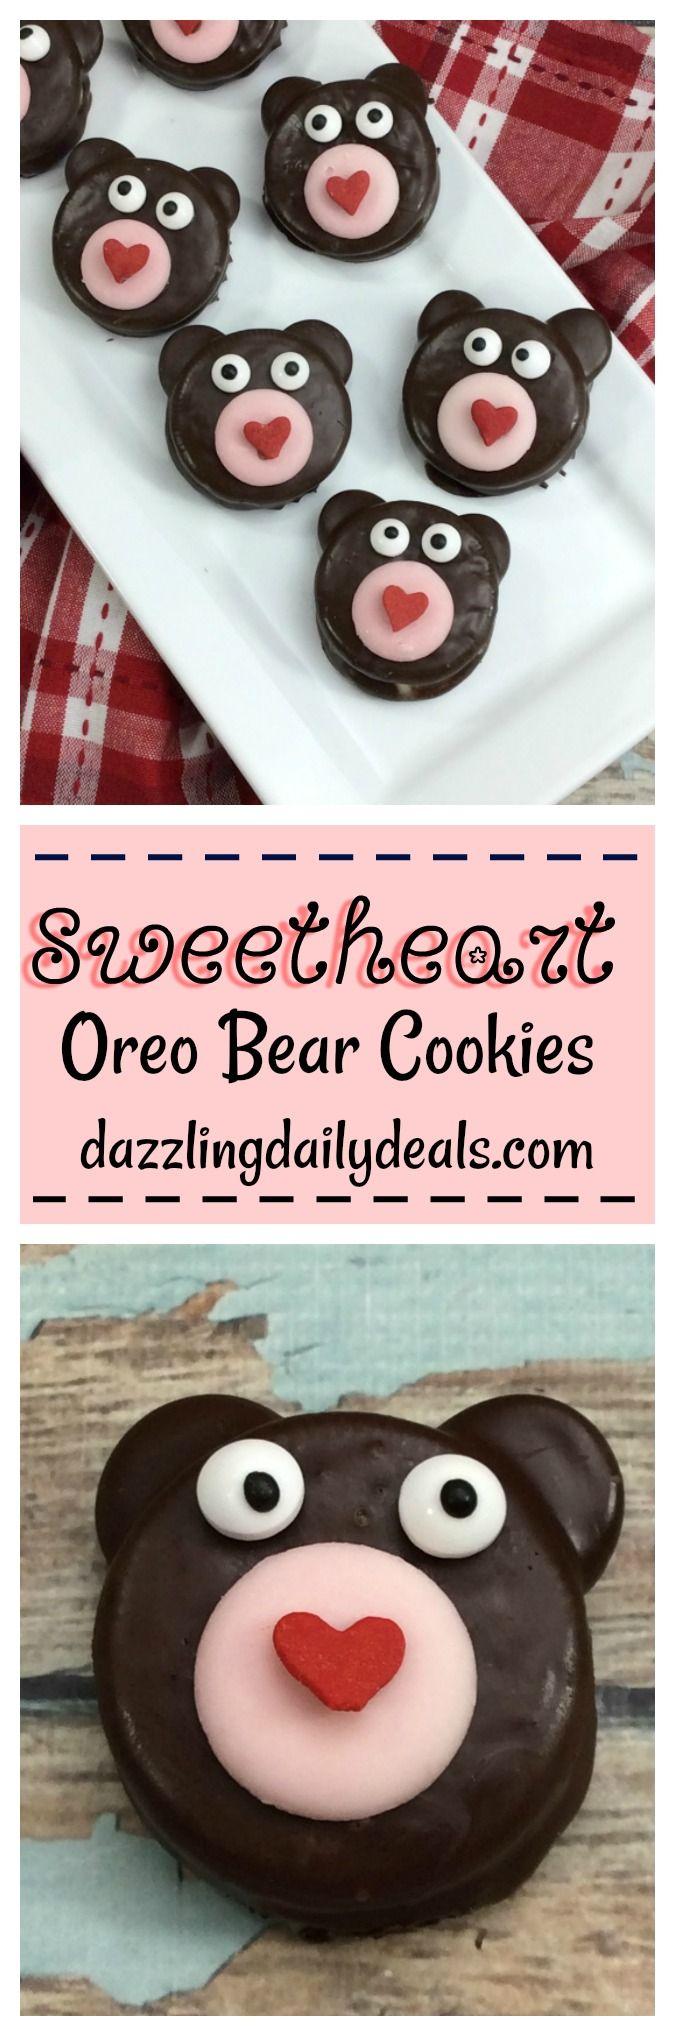 Sweetheart Oreo Bear Cookies #recipe | Dazzling Daily Deals